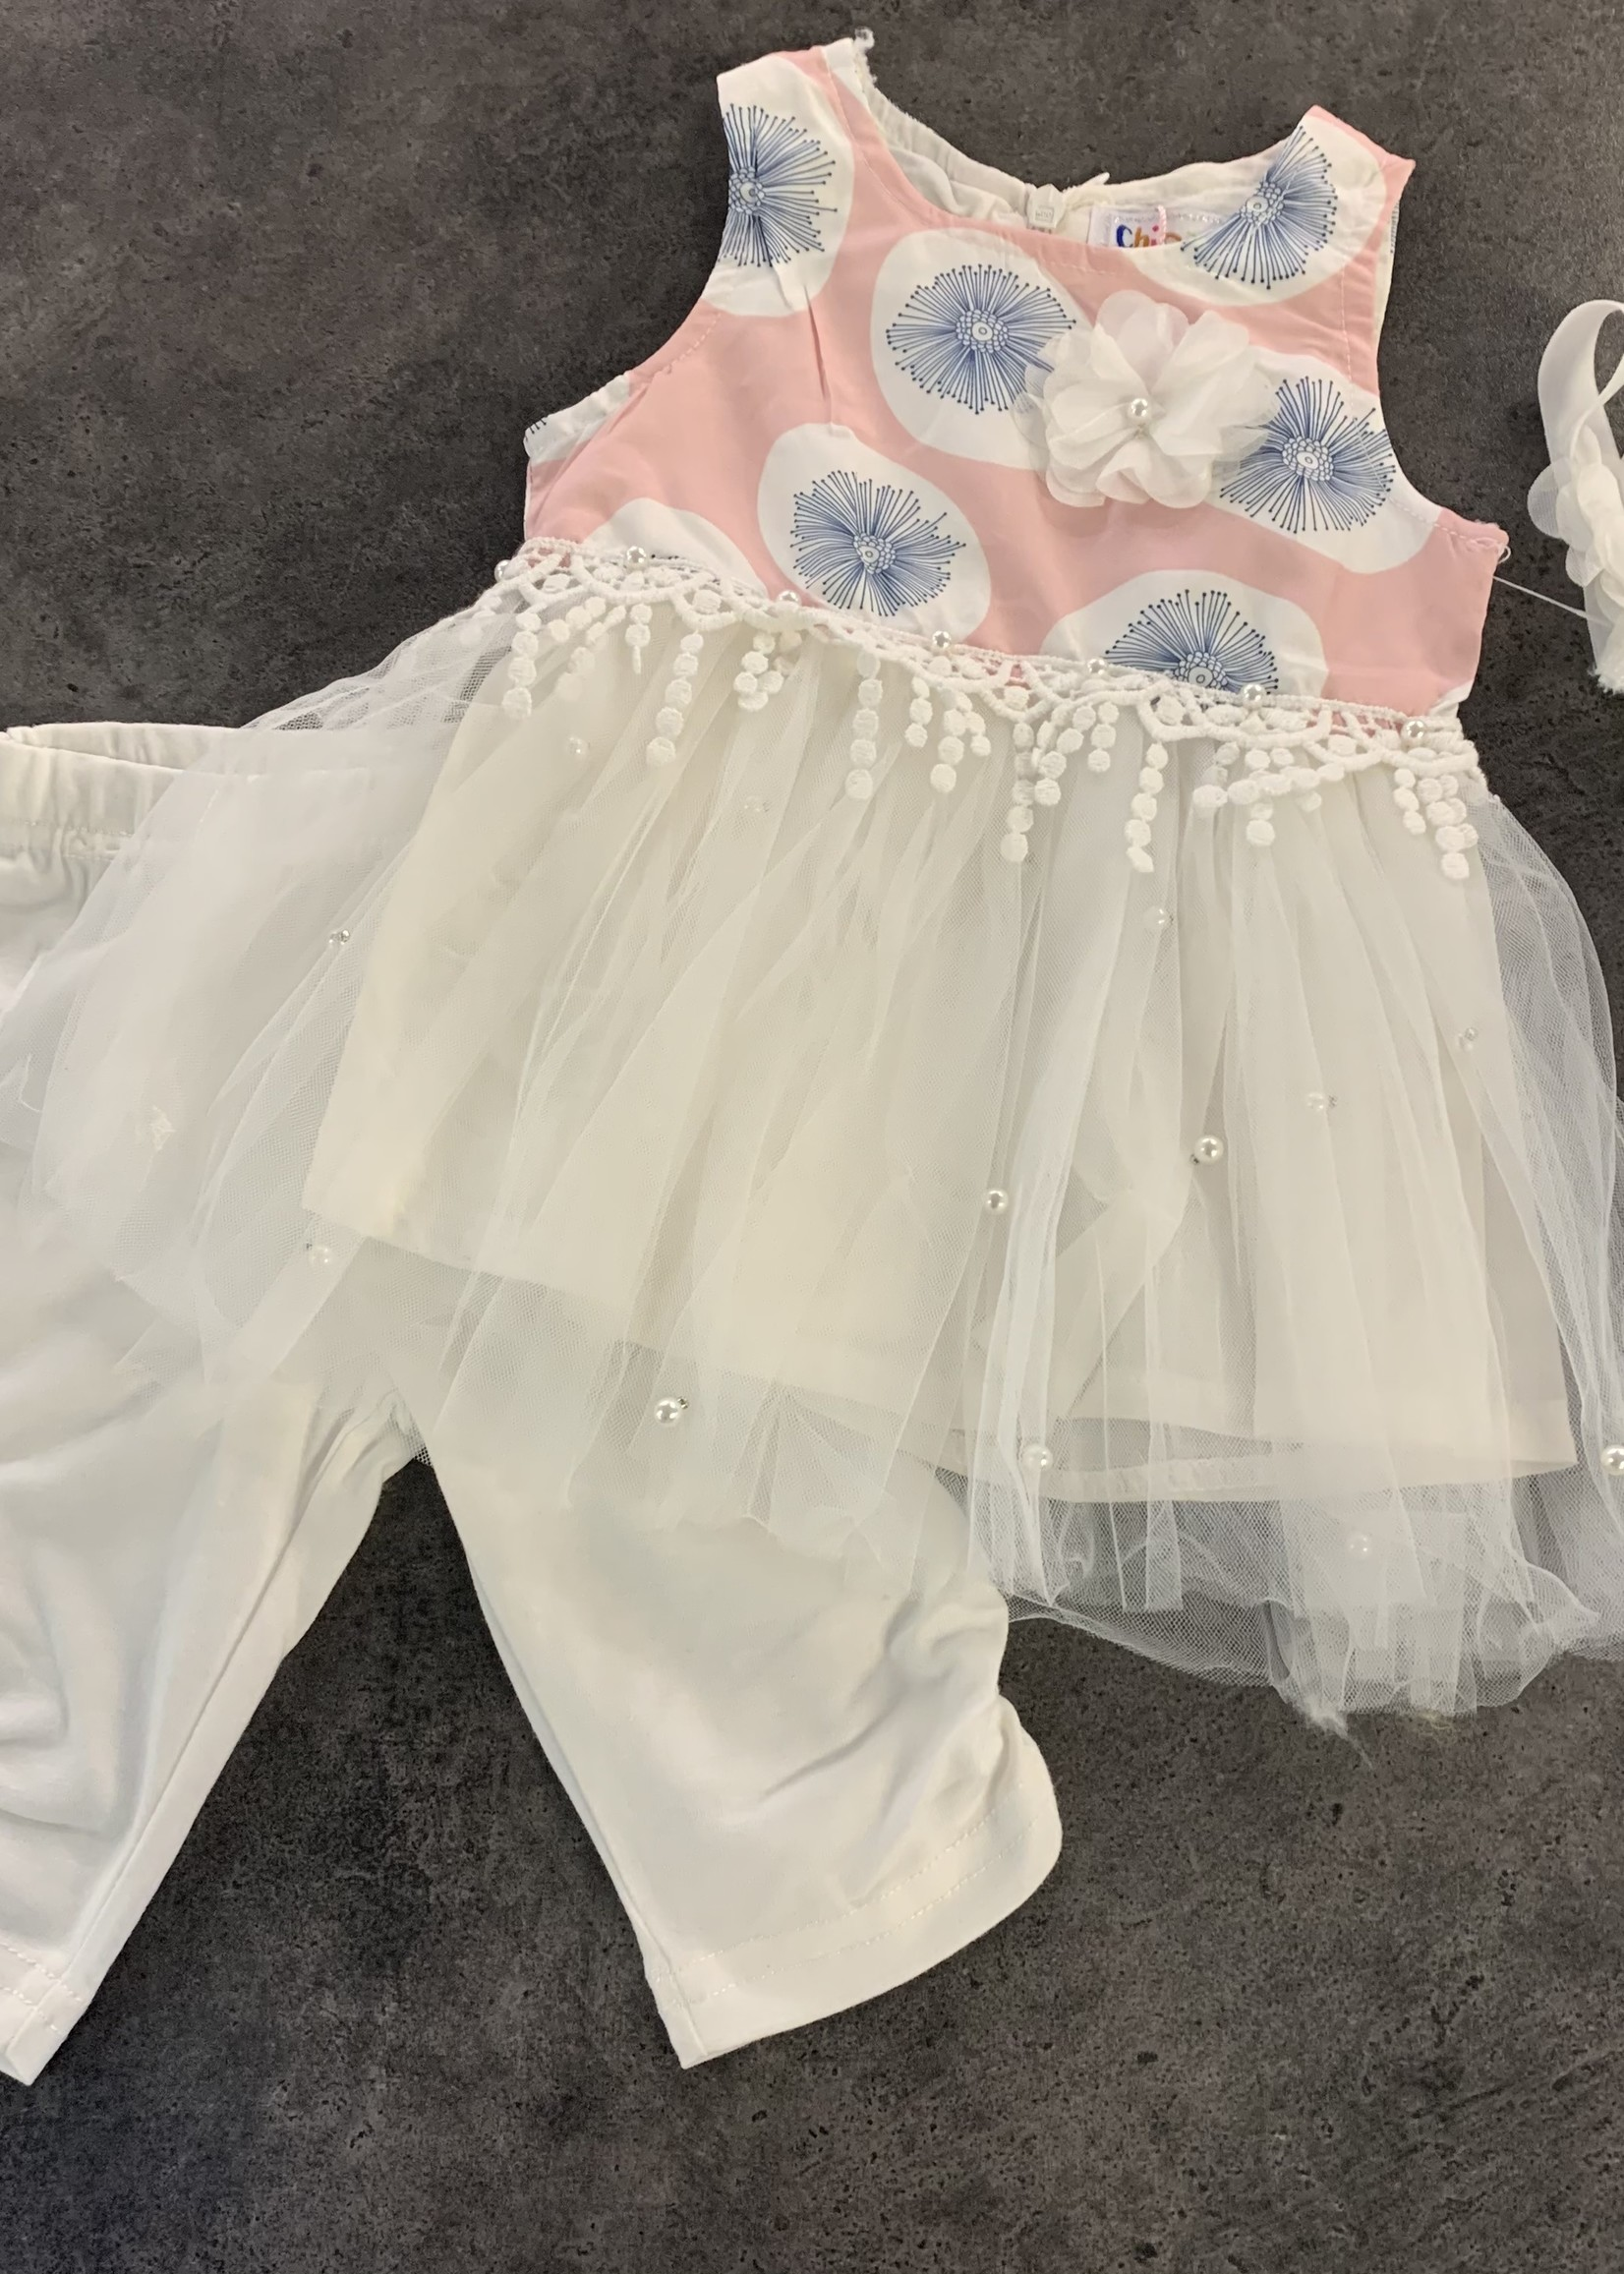 Divanis Divanis baby flower dress set